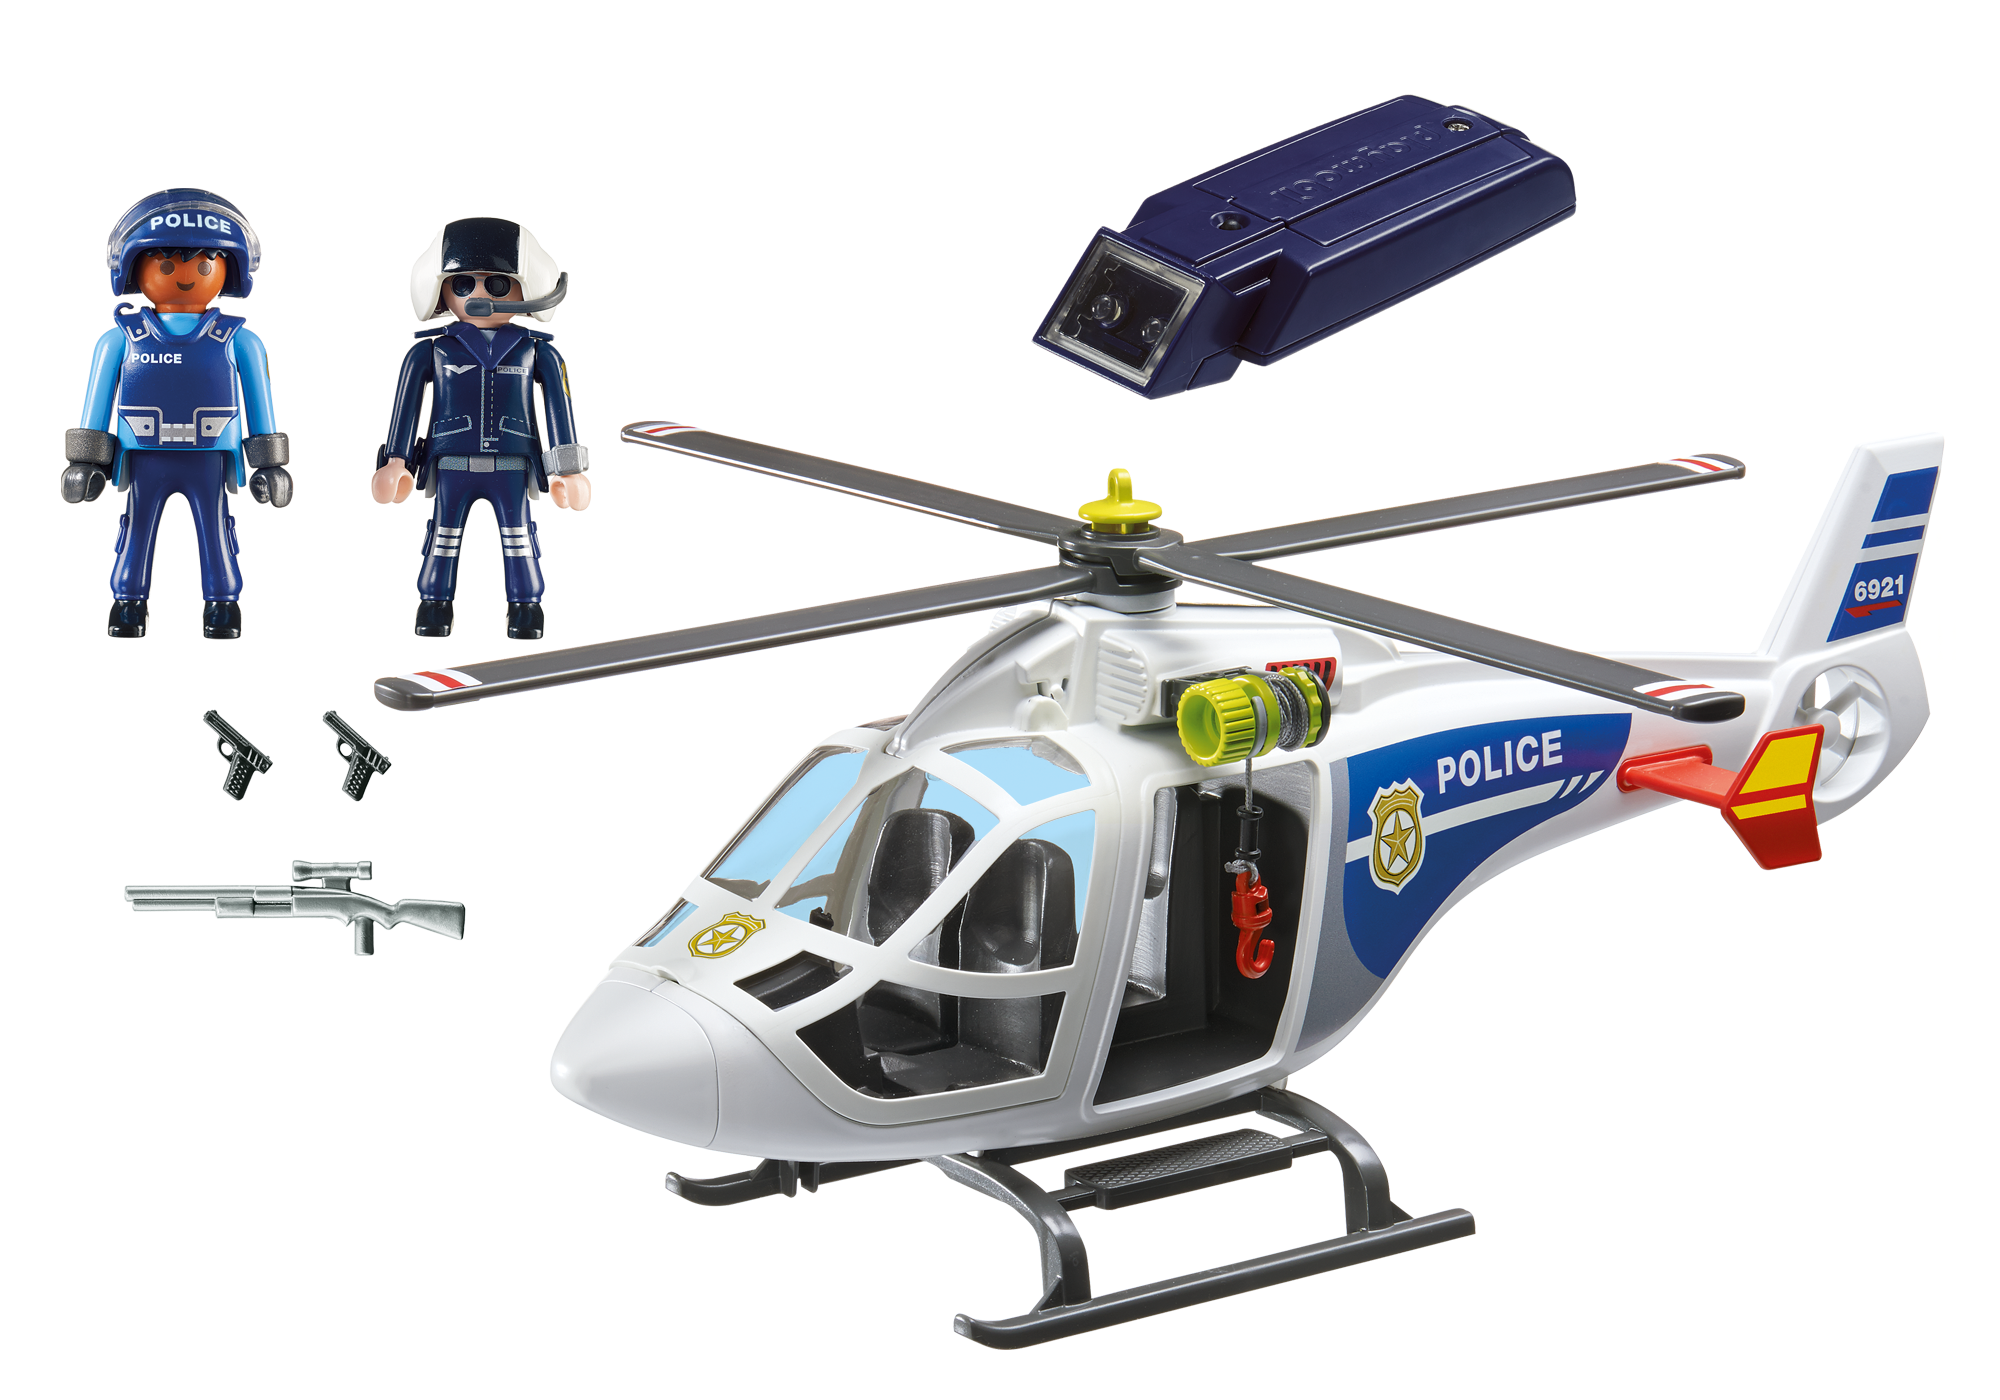 http://media.playmobil.com/i/playmobil/6921_product_box_back/Helikopter policyjny z reflektorem LED